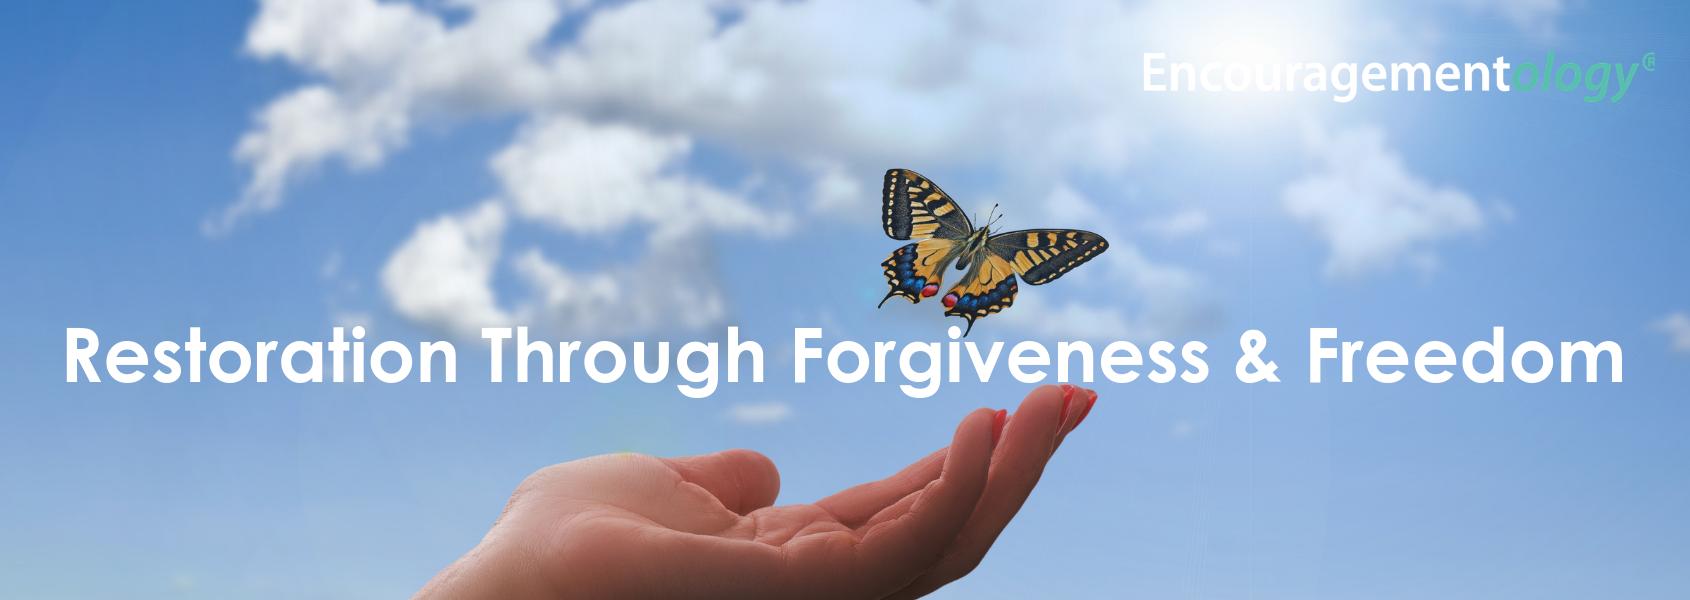 Restoration through forgiveness and freedom